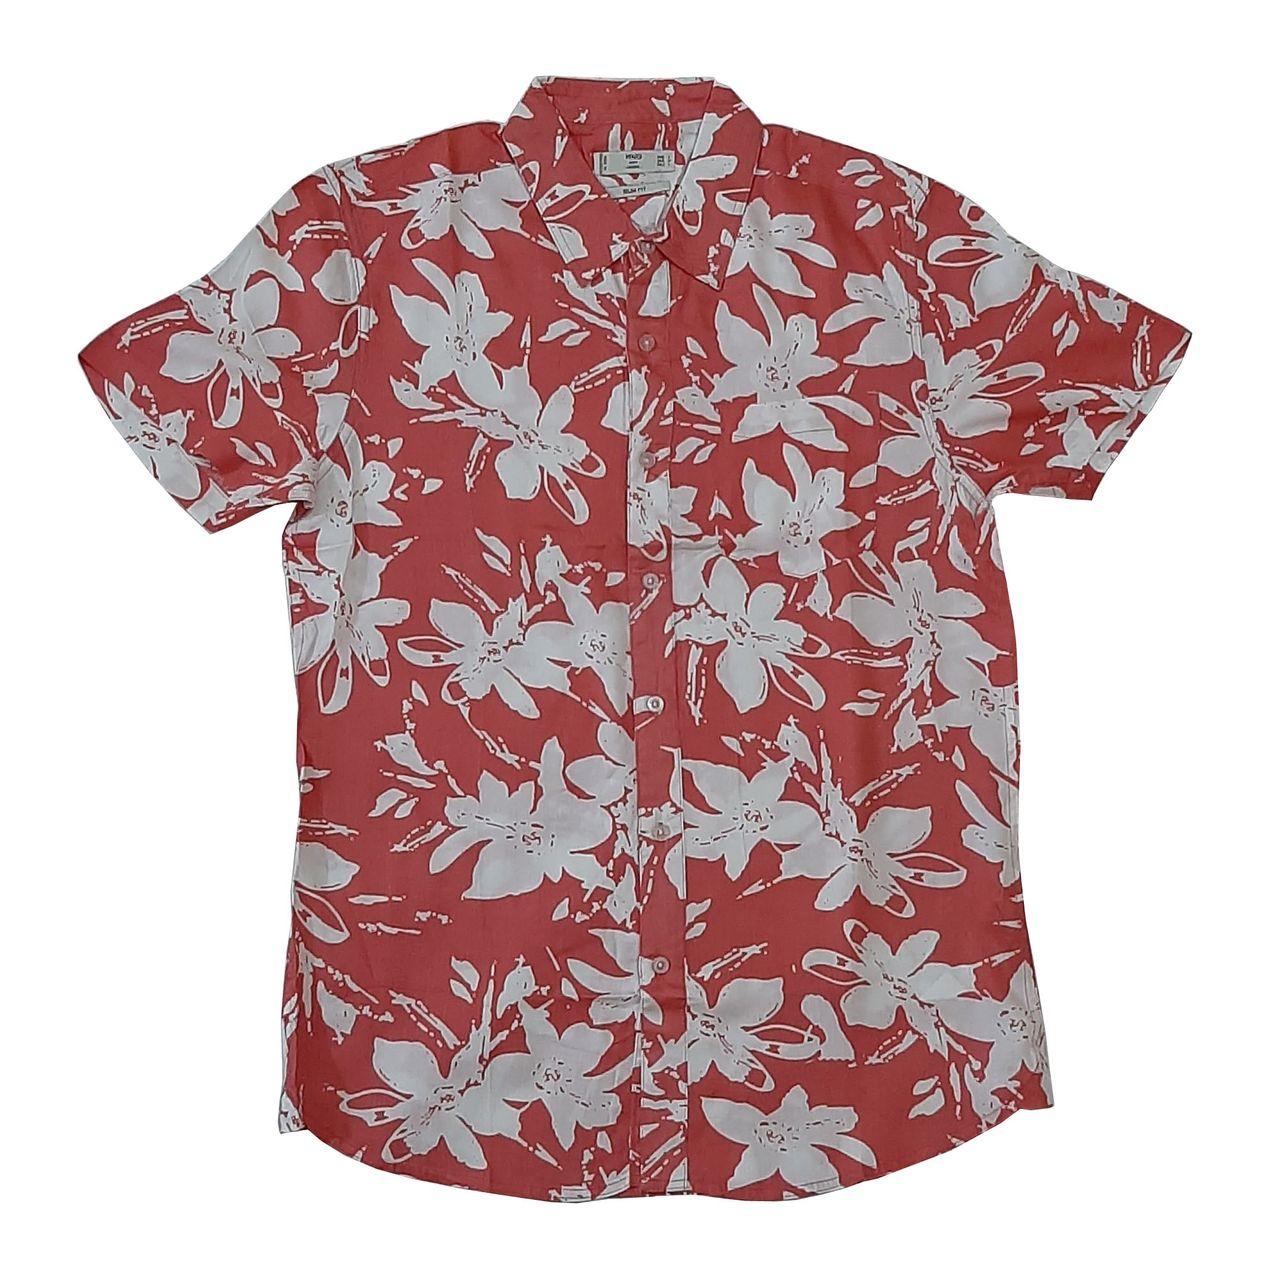 پیراهن مردانه مانگو مدل hawaii-P